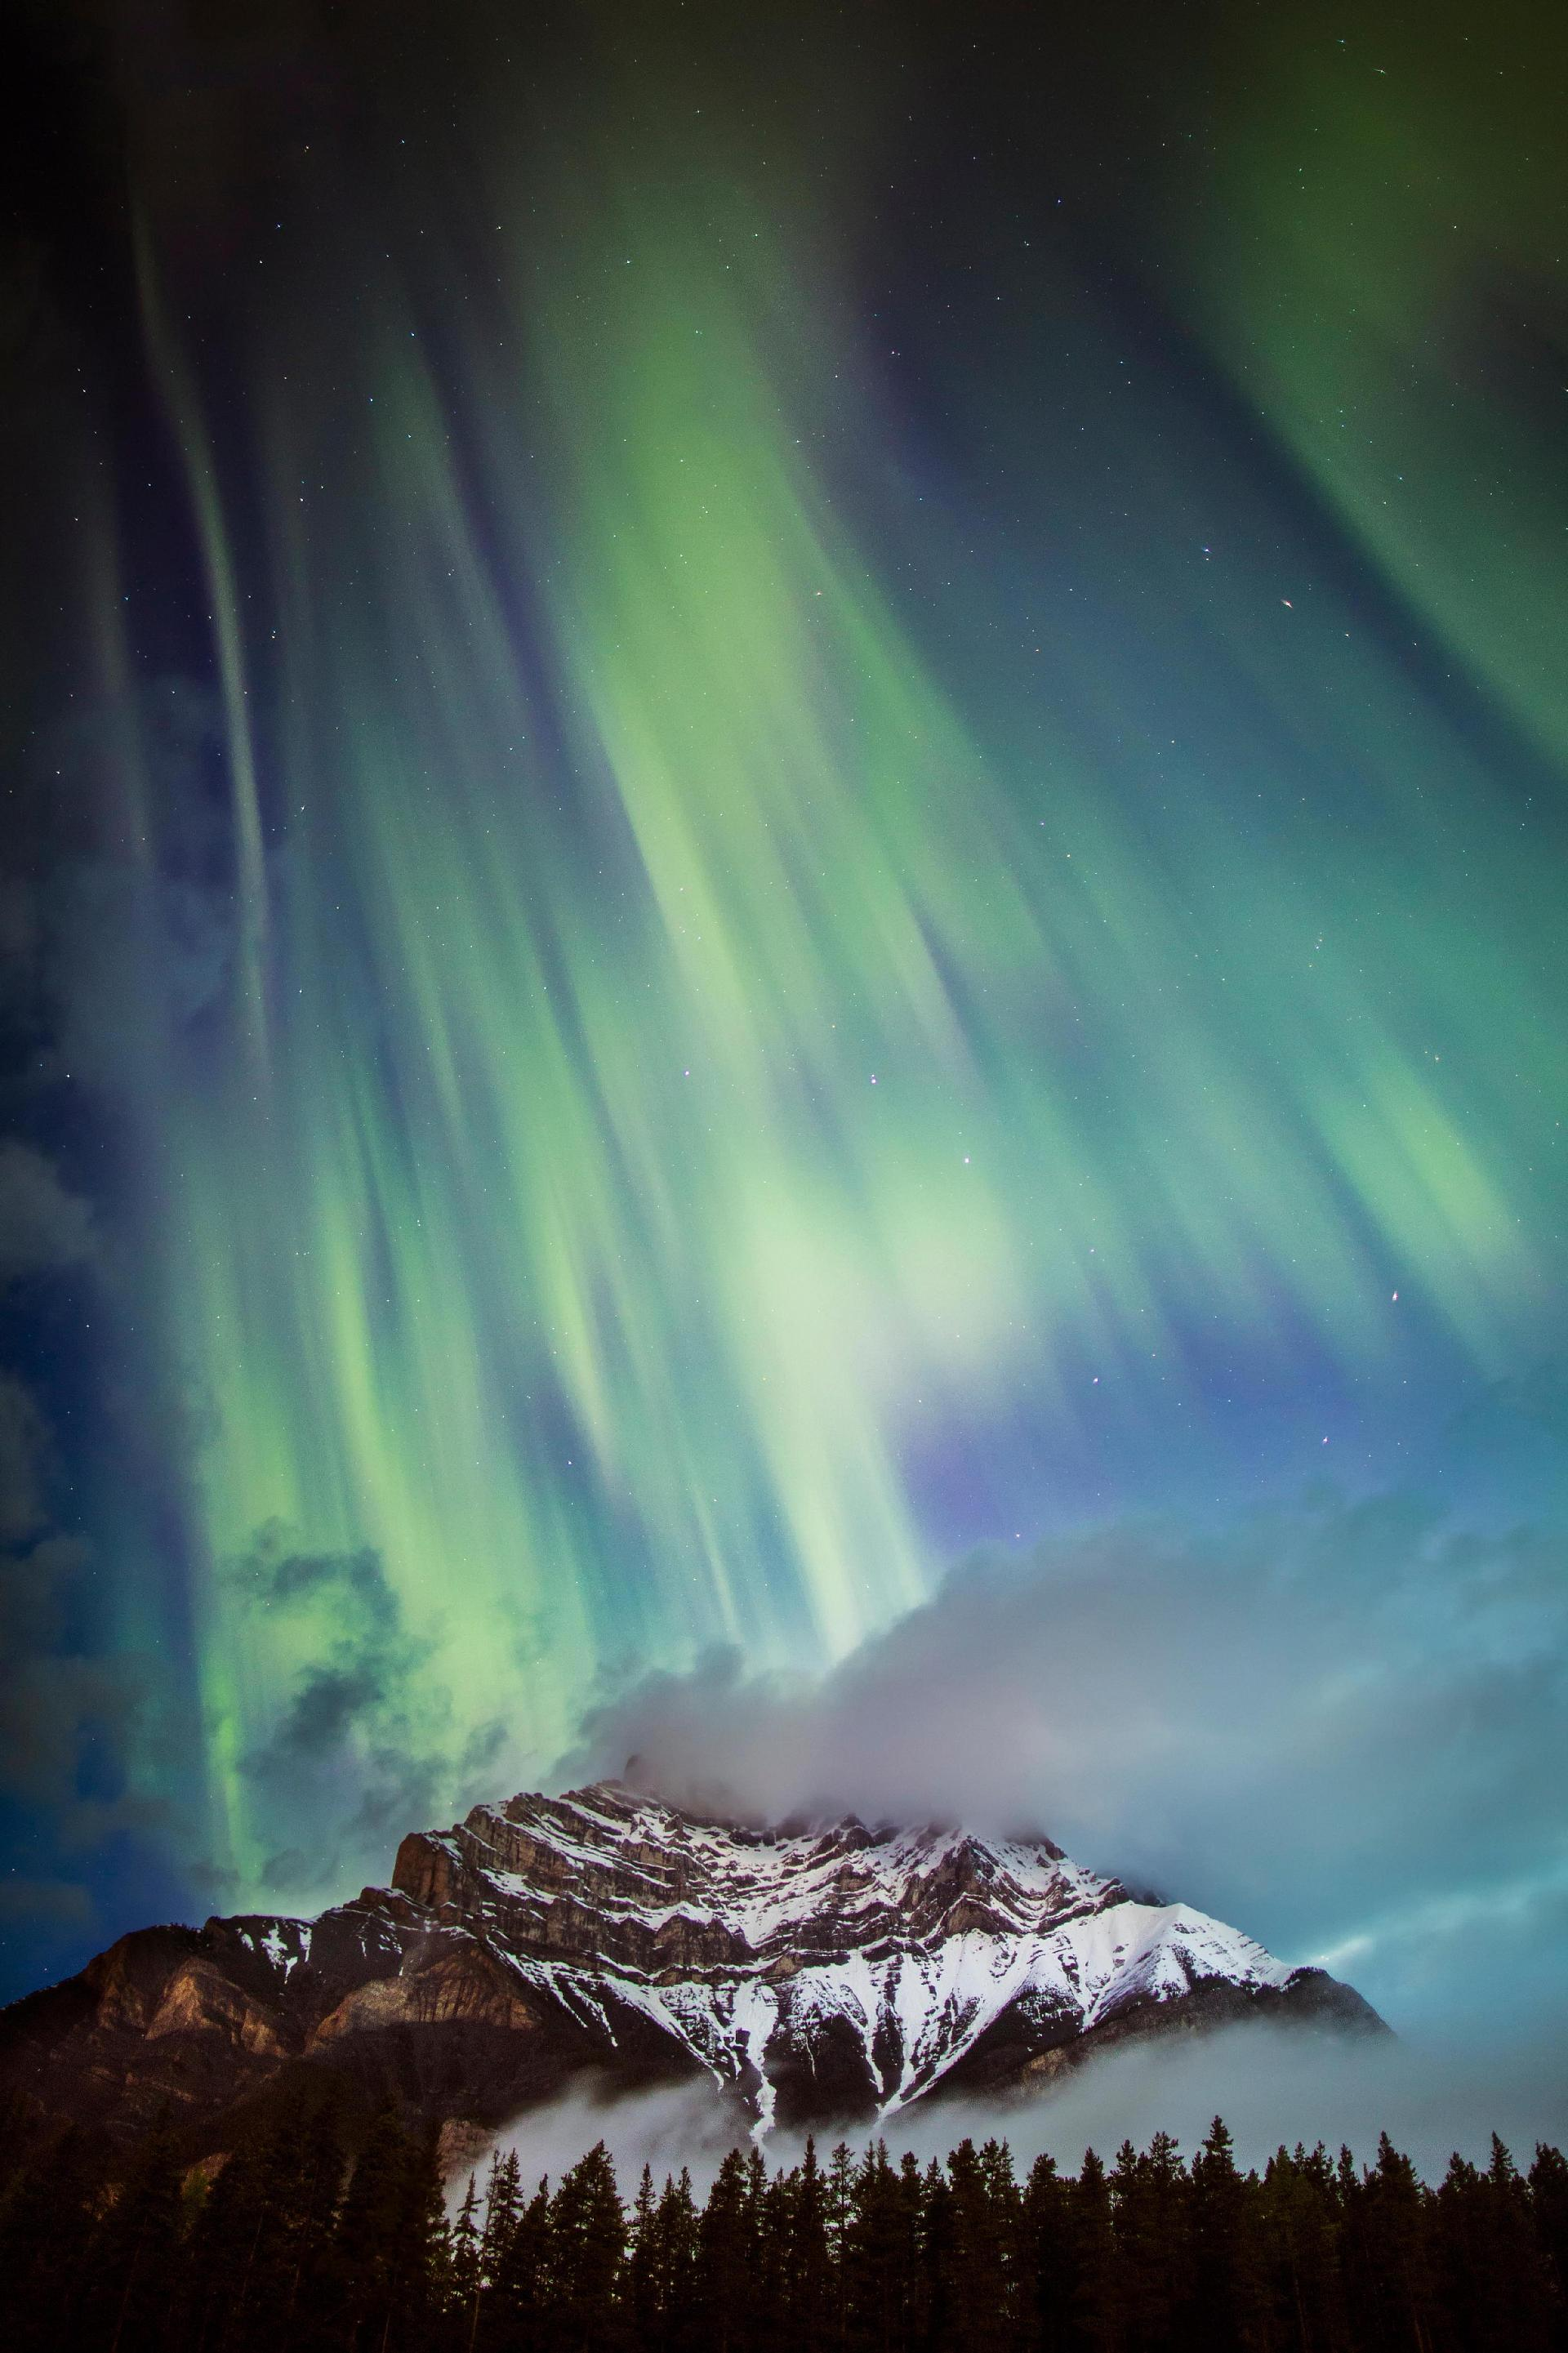 The aurora shot by Paul Zizka